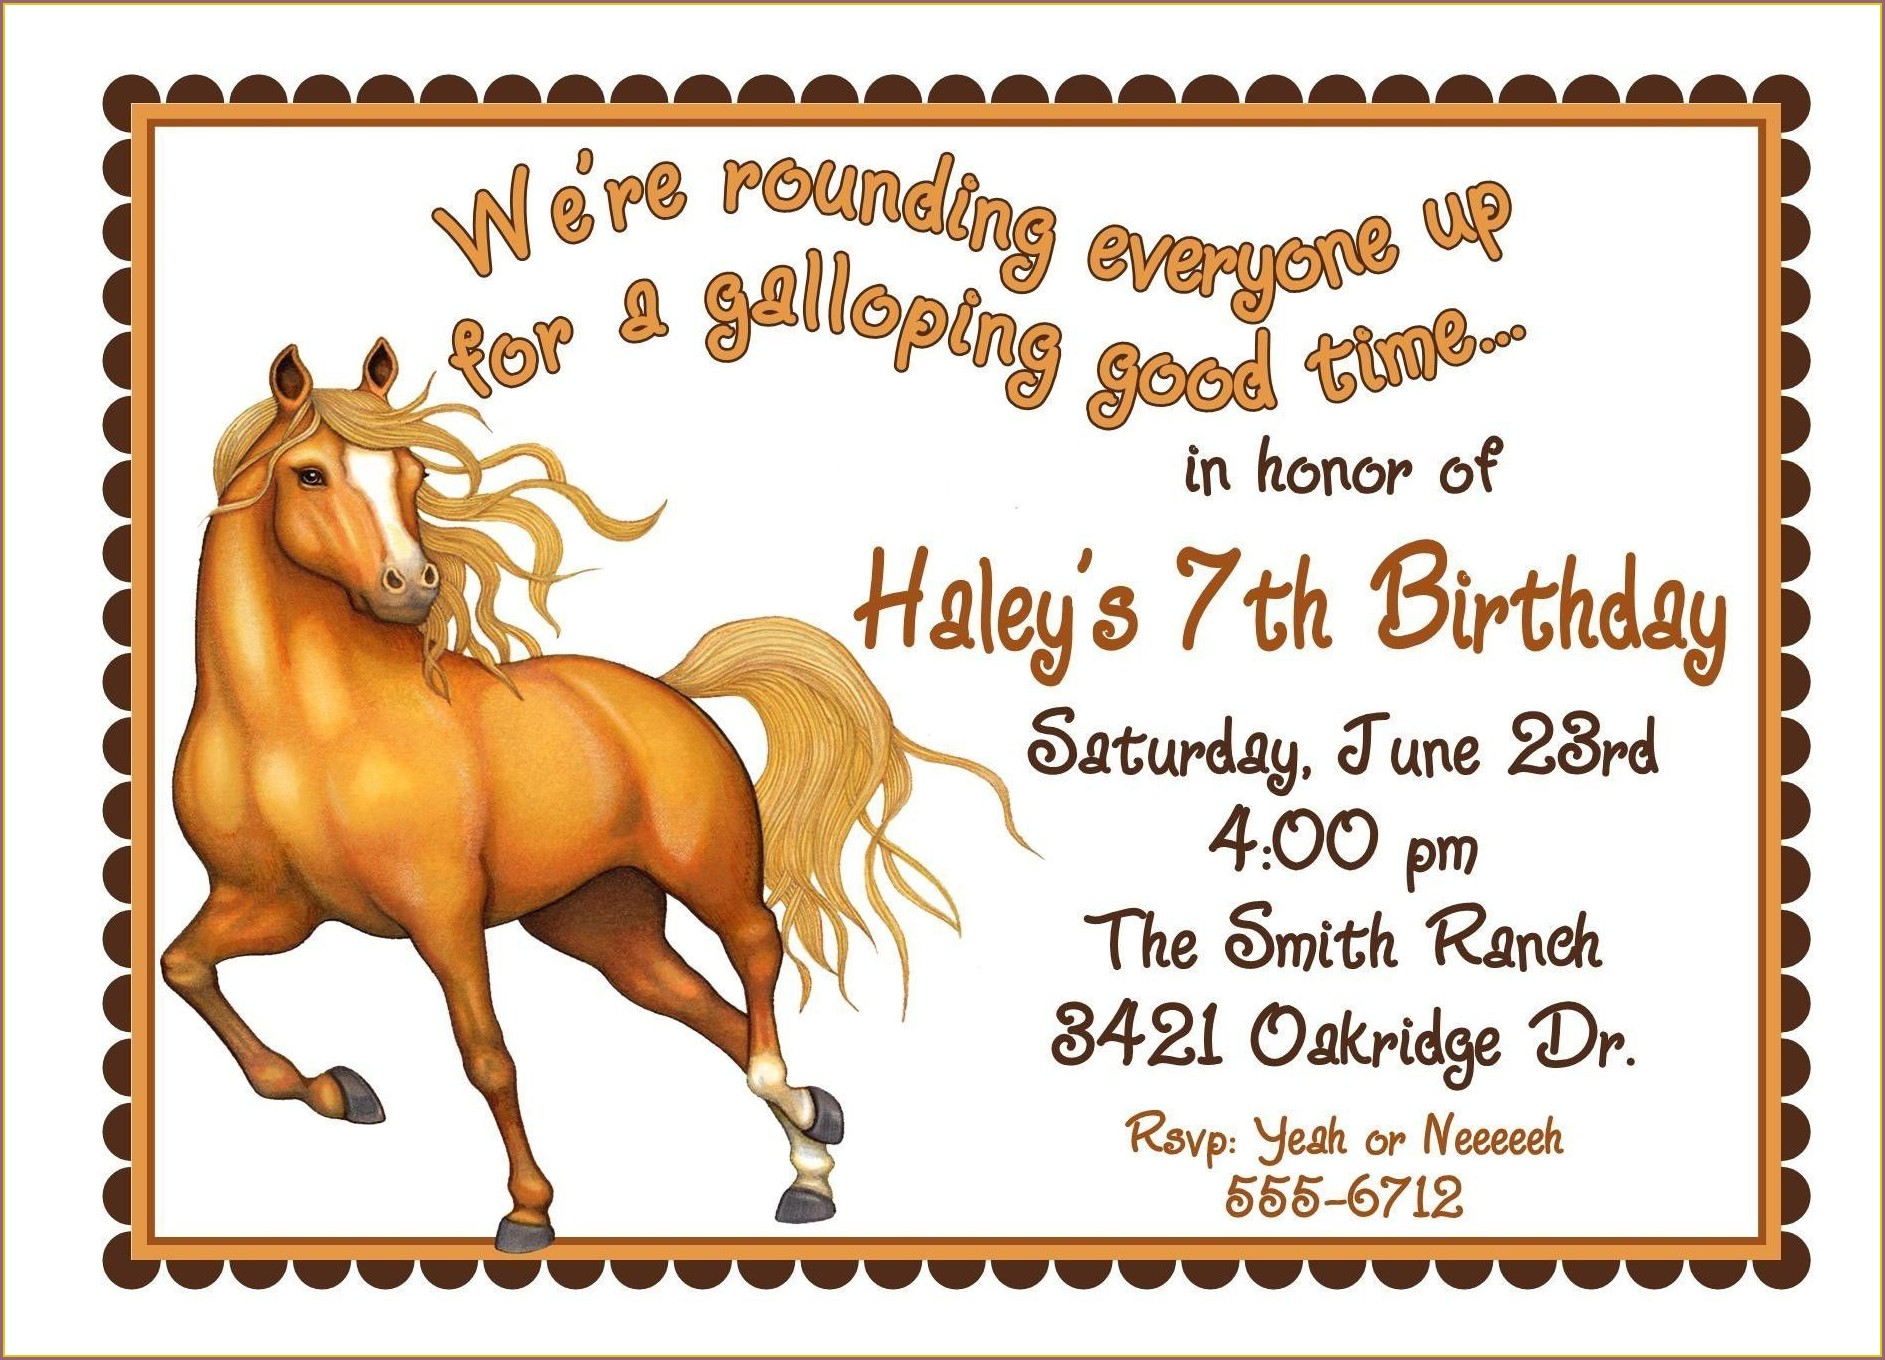 Personalized Horse Birthday Invitations